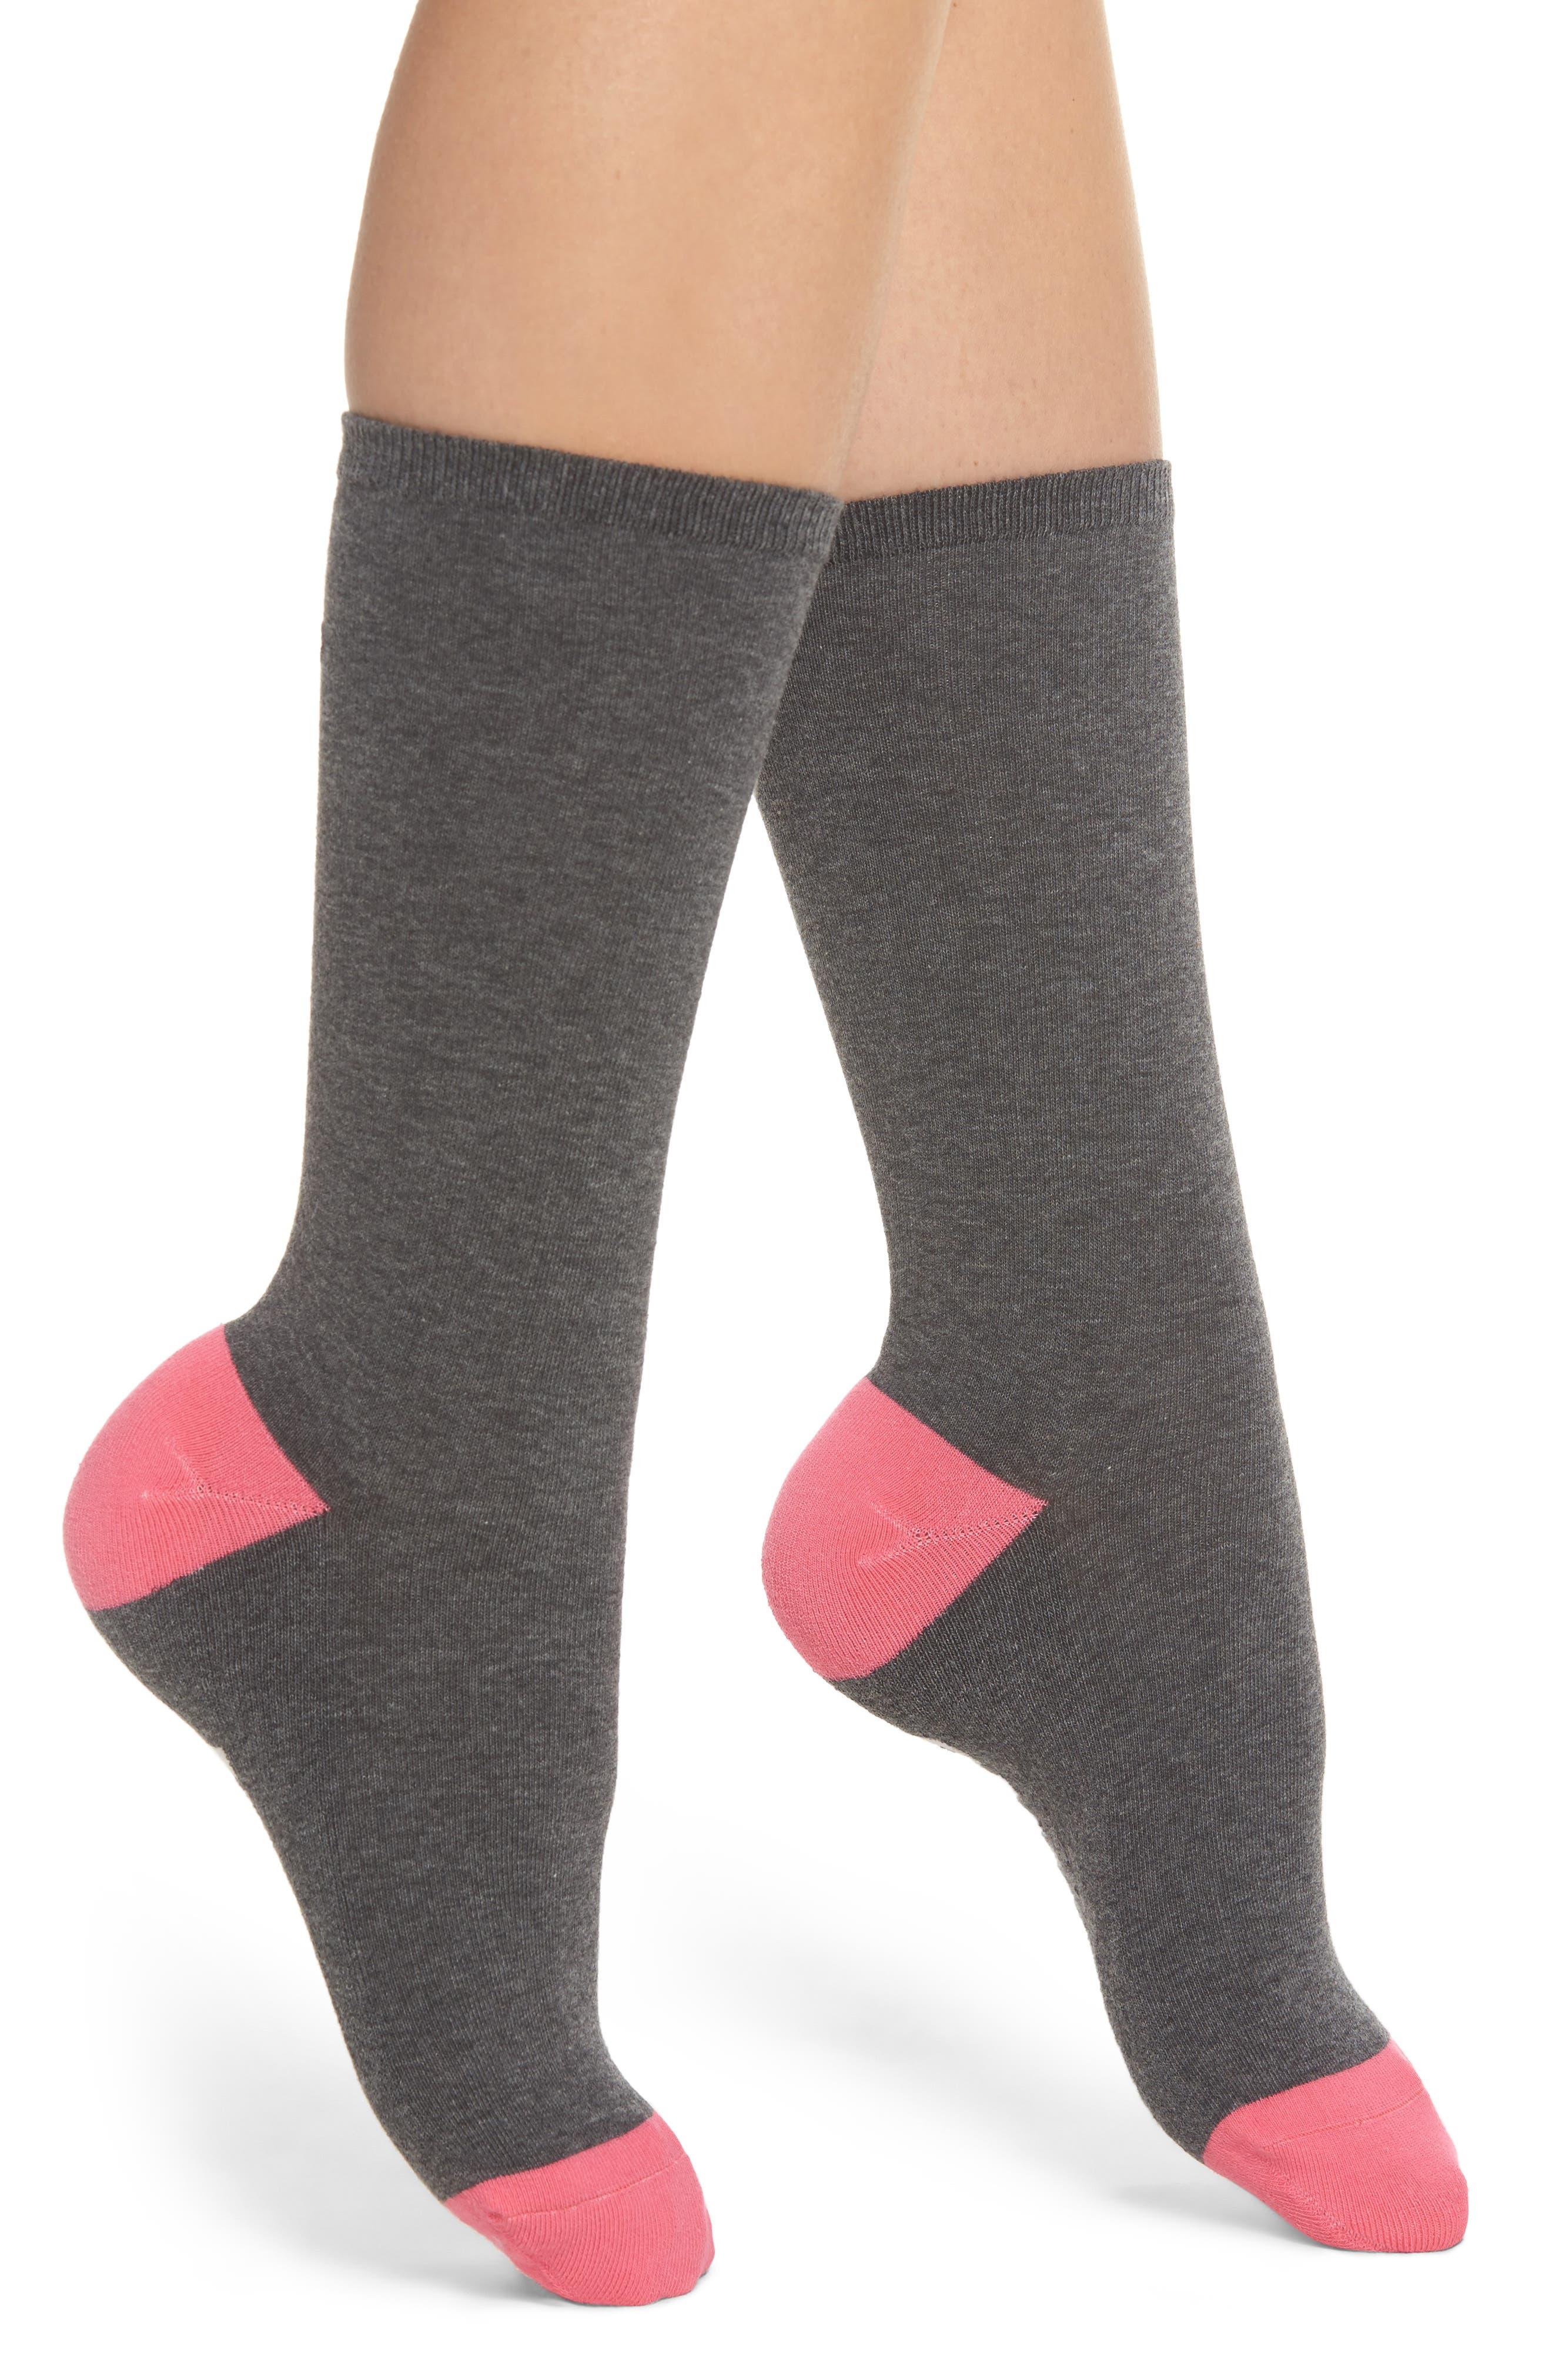 Keep Vibing Crew Socks,                         Main,                         color,